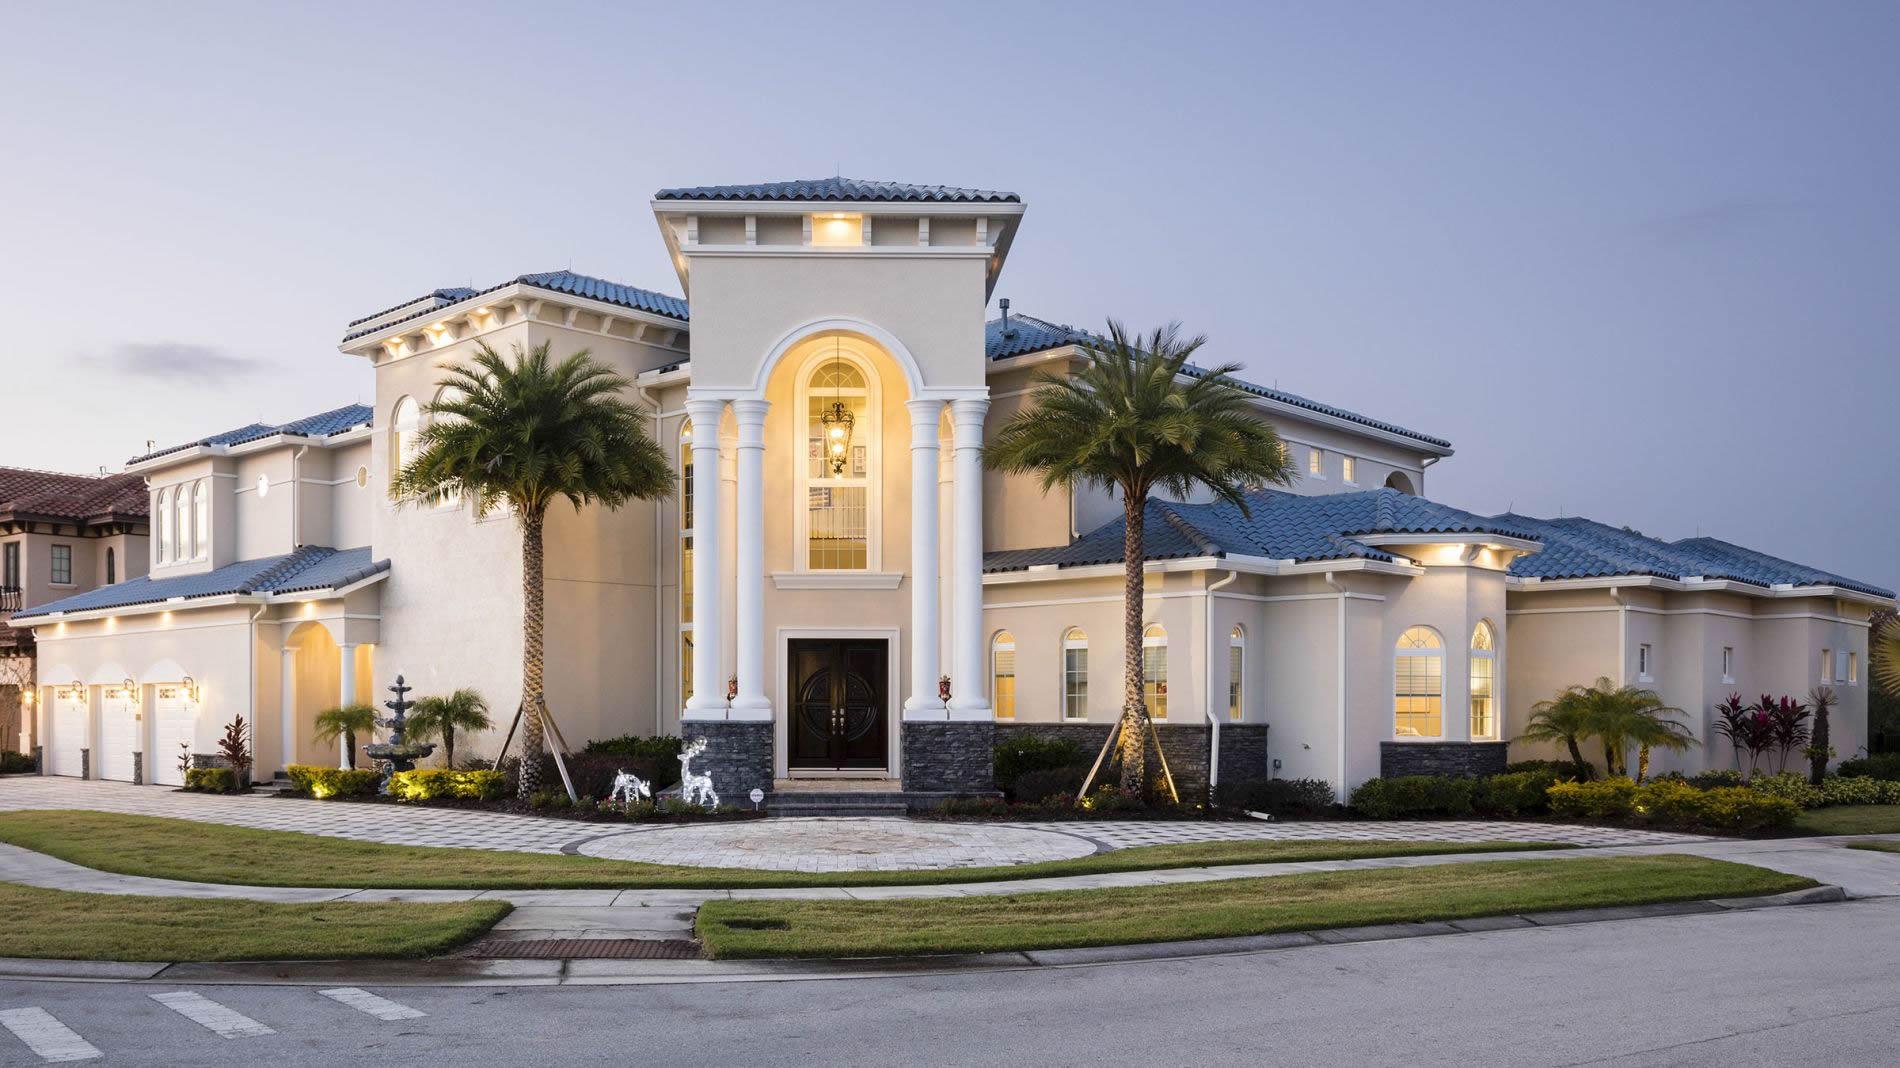 Luxury Vacation Rentals - Orlando FL